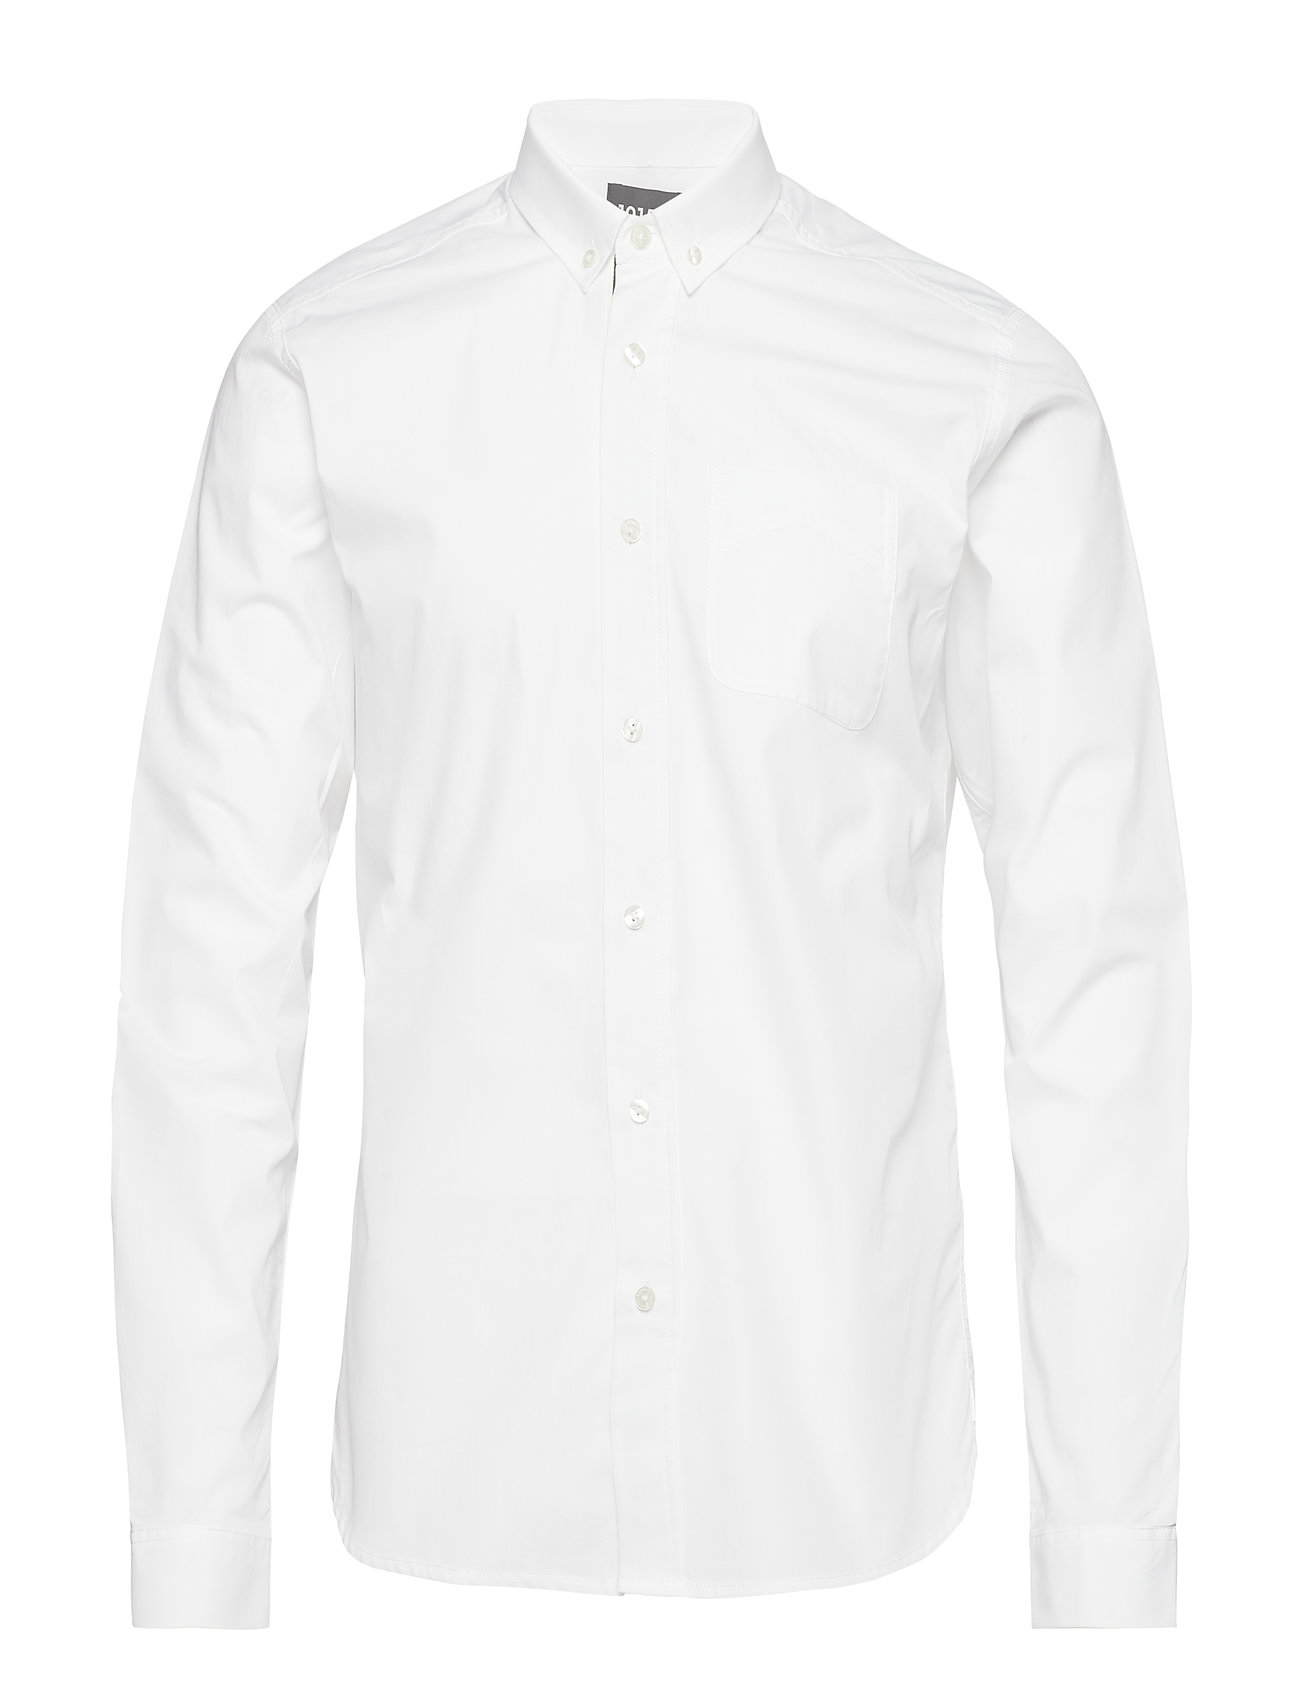 Scotch & Soda Ams blåw premium dress shirt Ögrönlar